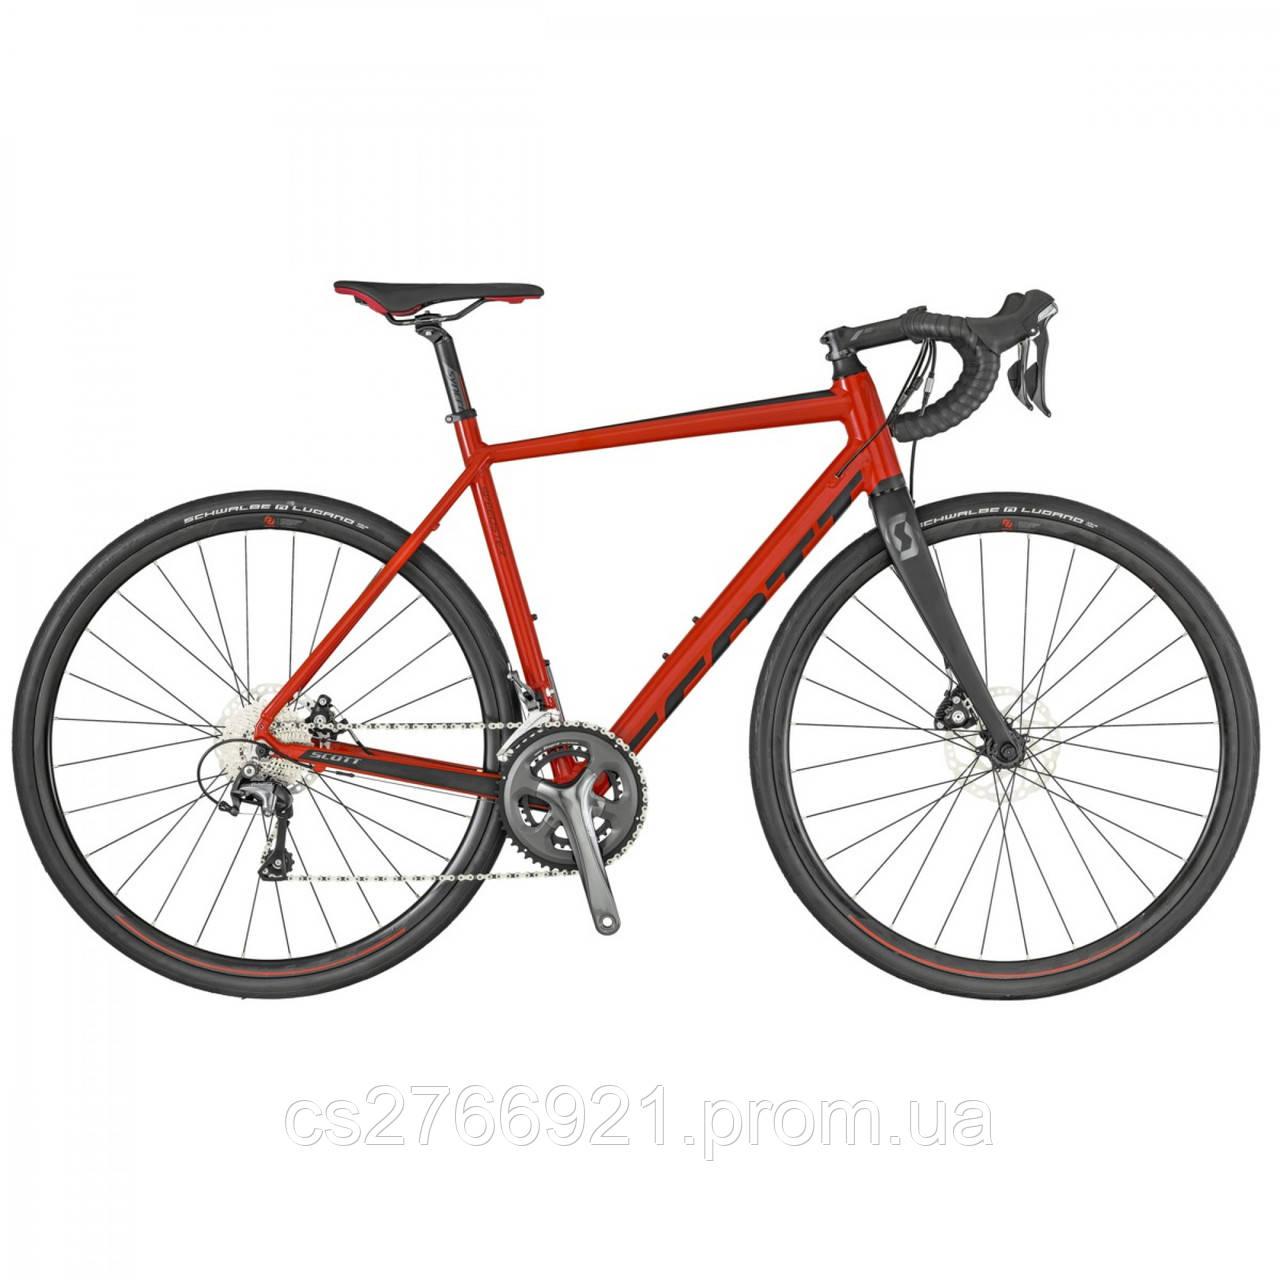 Велосипед SCOTT Speedster 20 disc (CN) 19